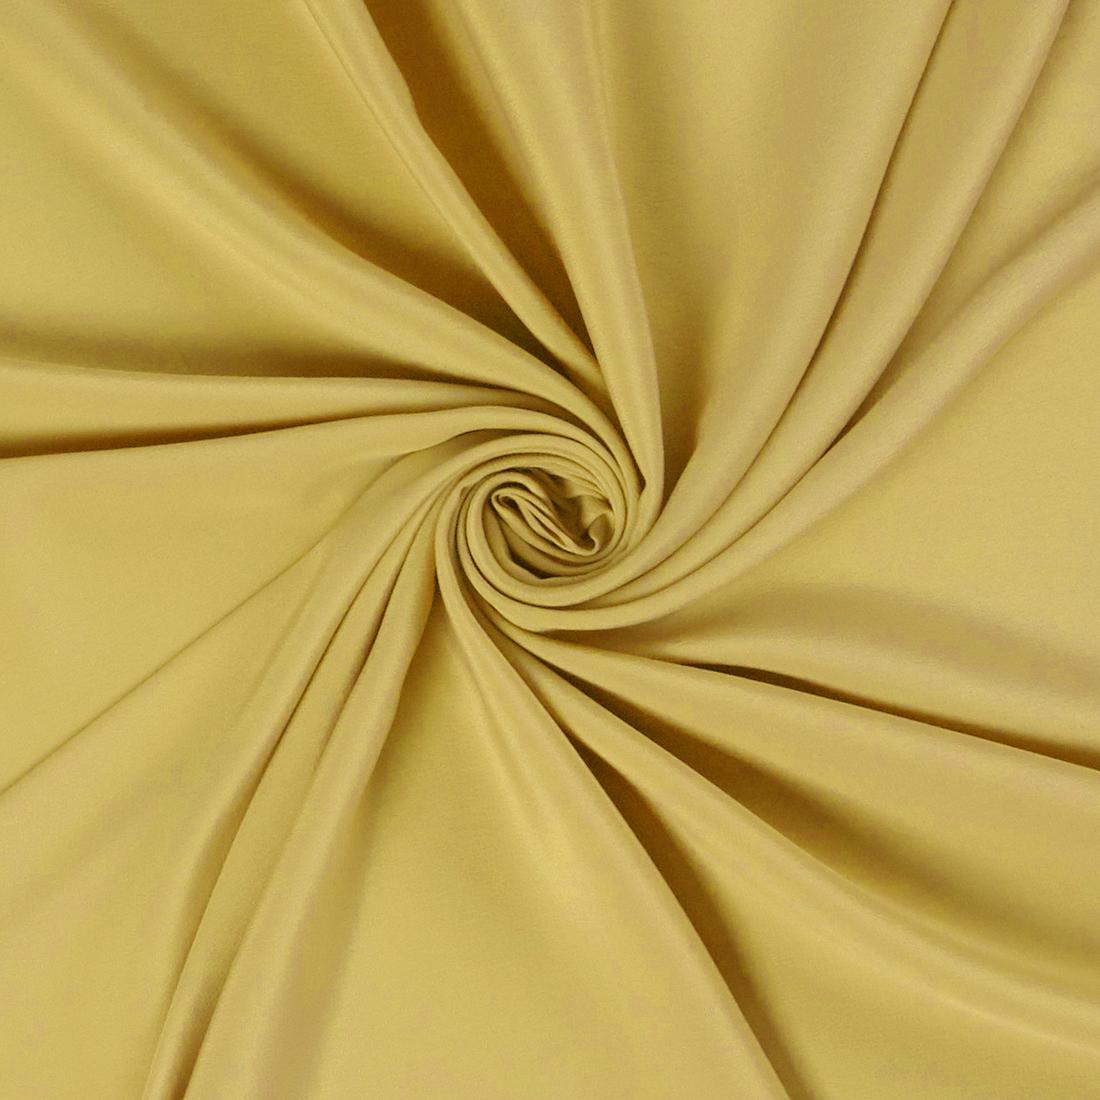 Silk Acetate Yellow Dress Fabric